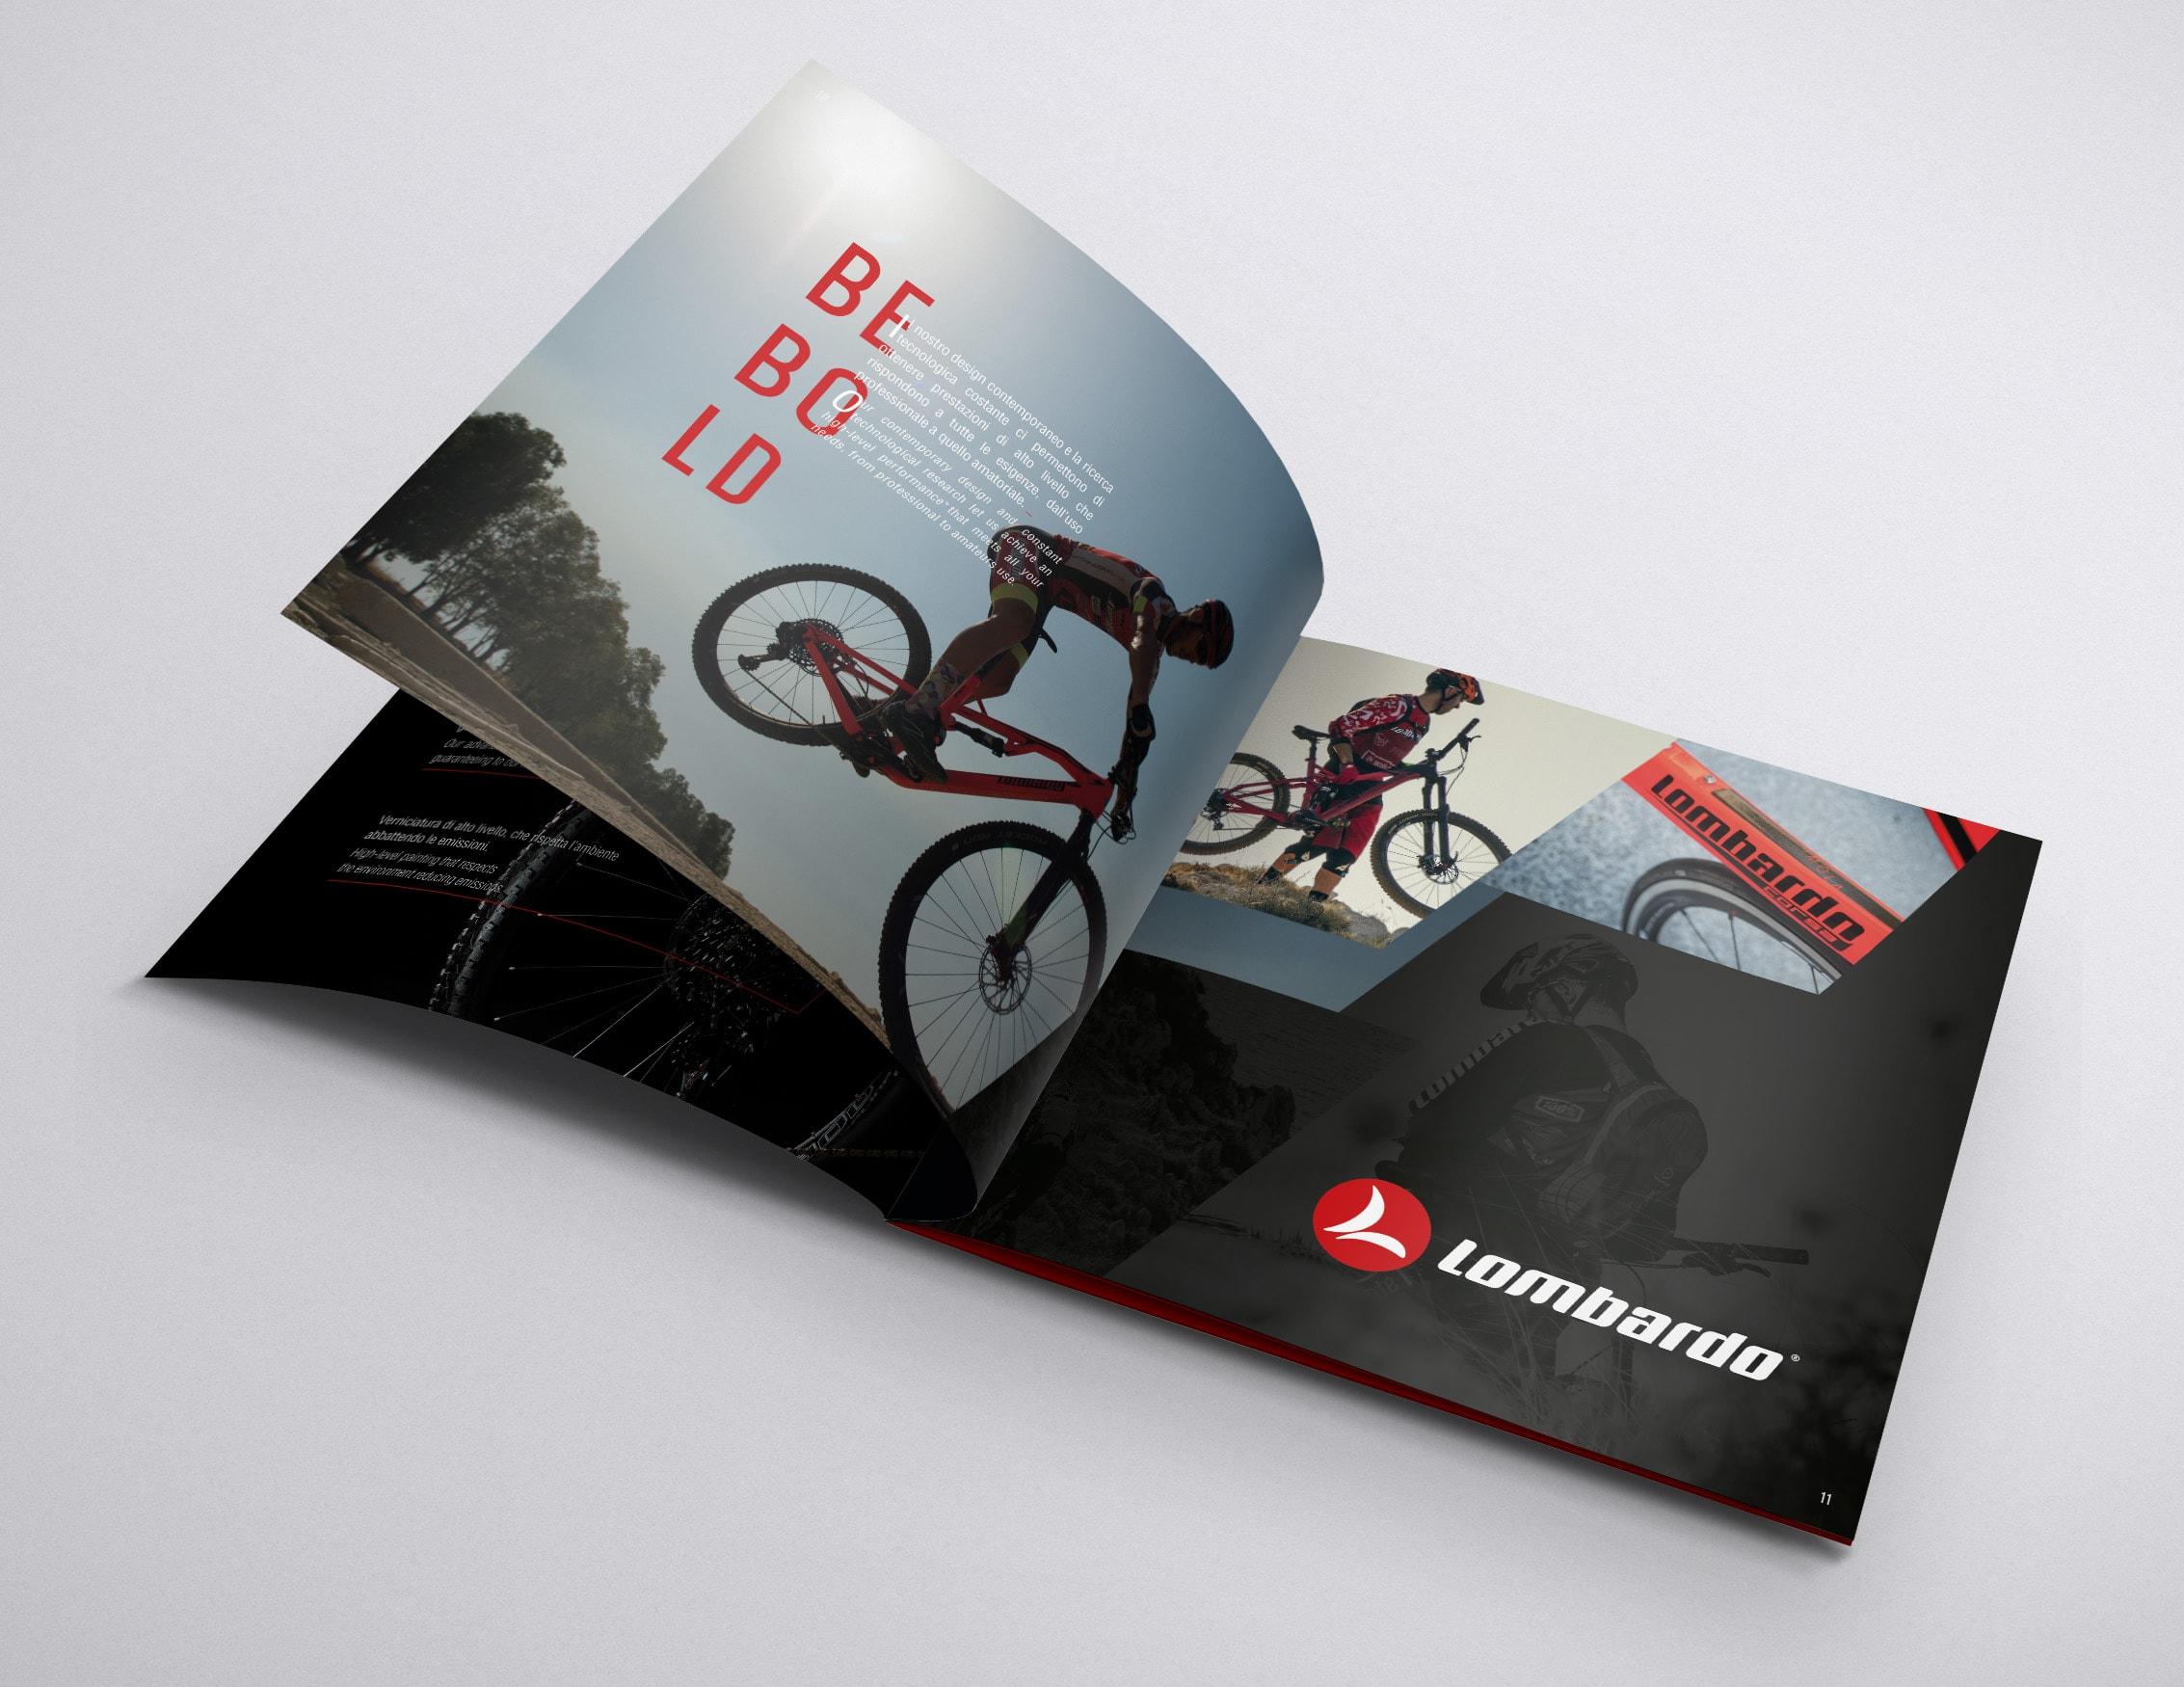 Adduma_Lombardo_bikes_catalog_06